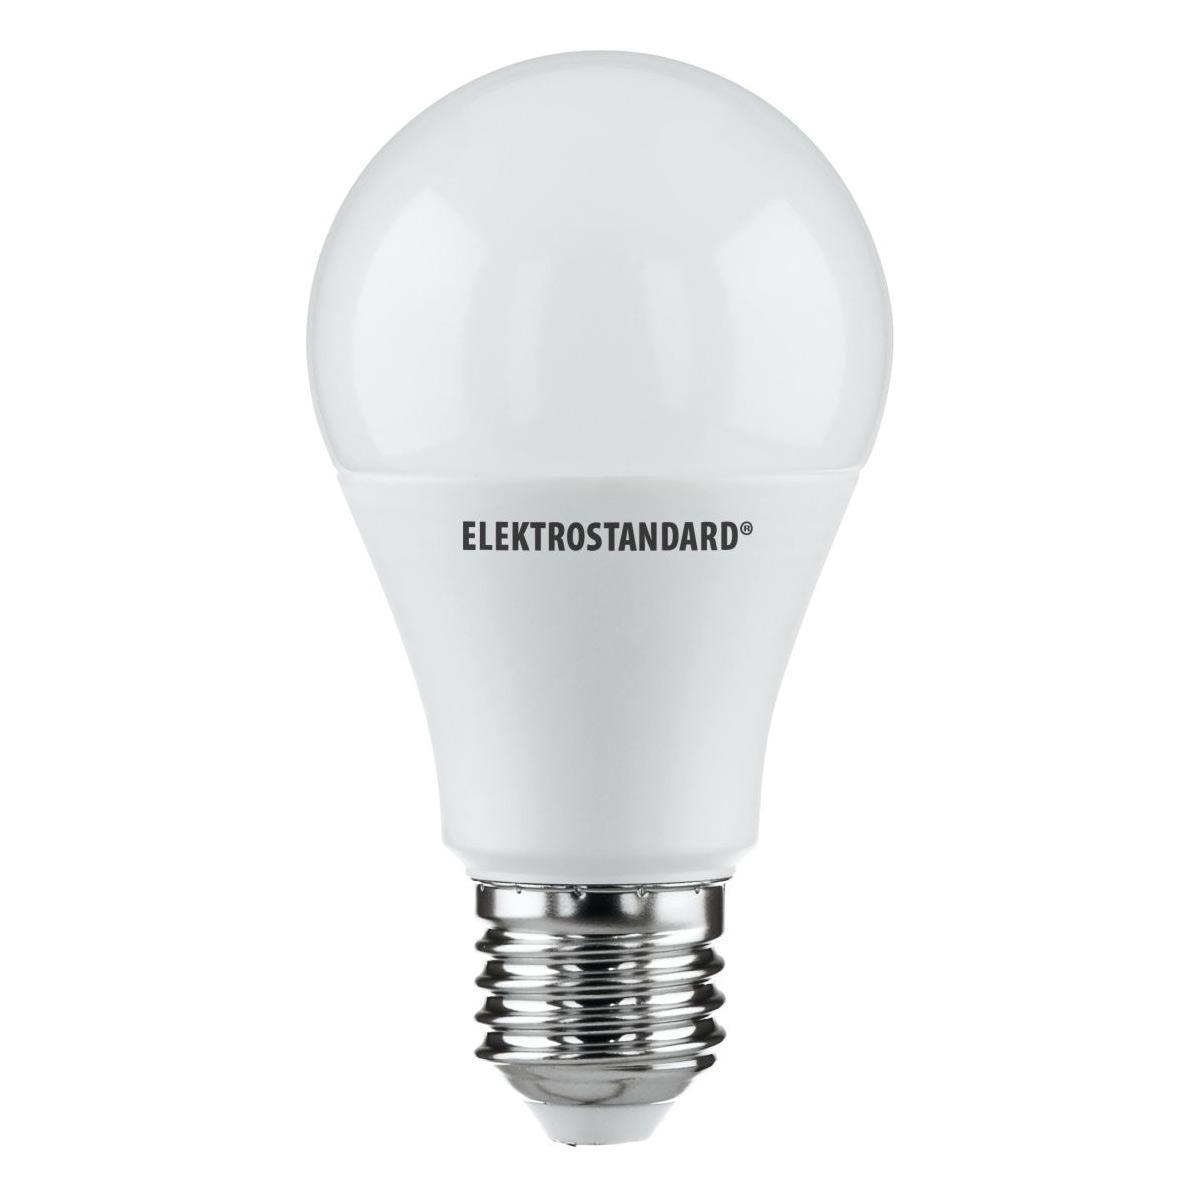 elektrostandard лампа светодиодная elektrostandard classic led d 10w 4200k e27 4690389085543 Лампа светодиодная E27 10W 4200K матовая 4690389085543